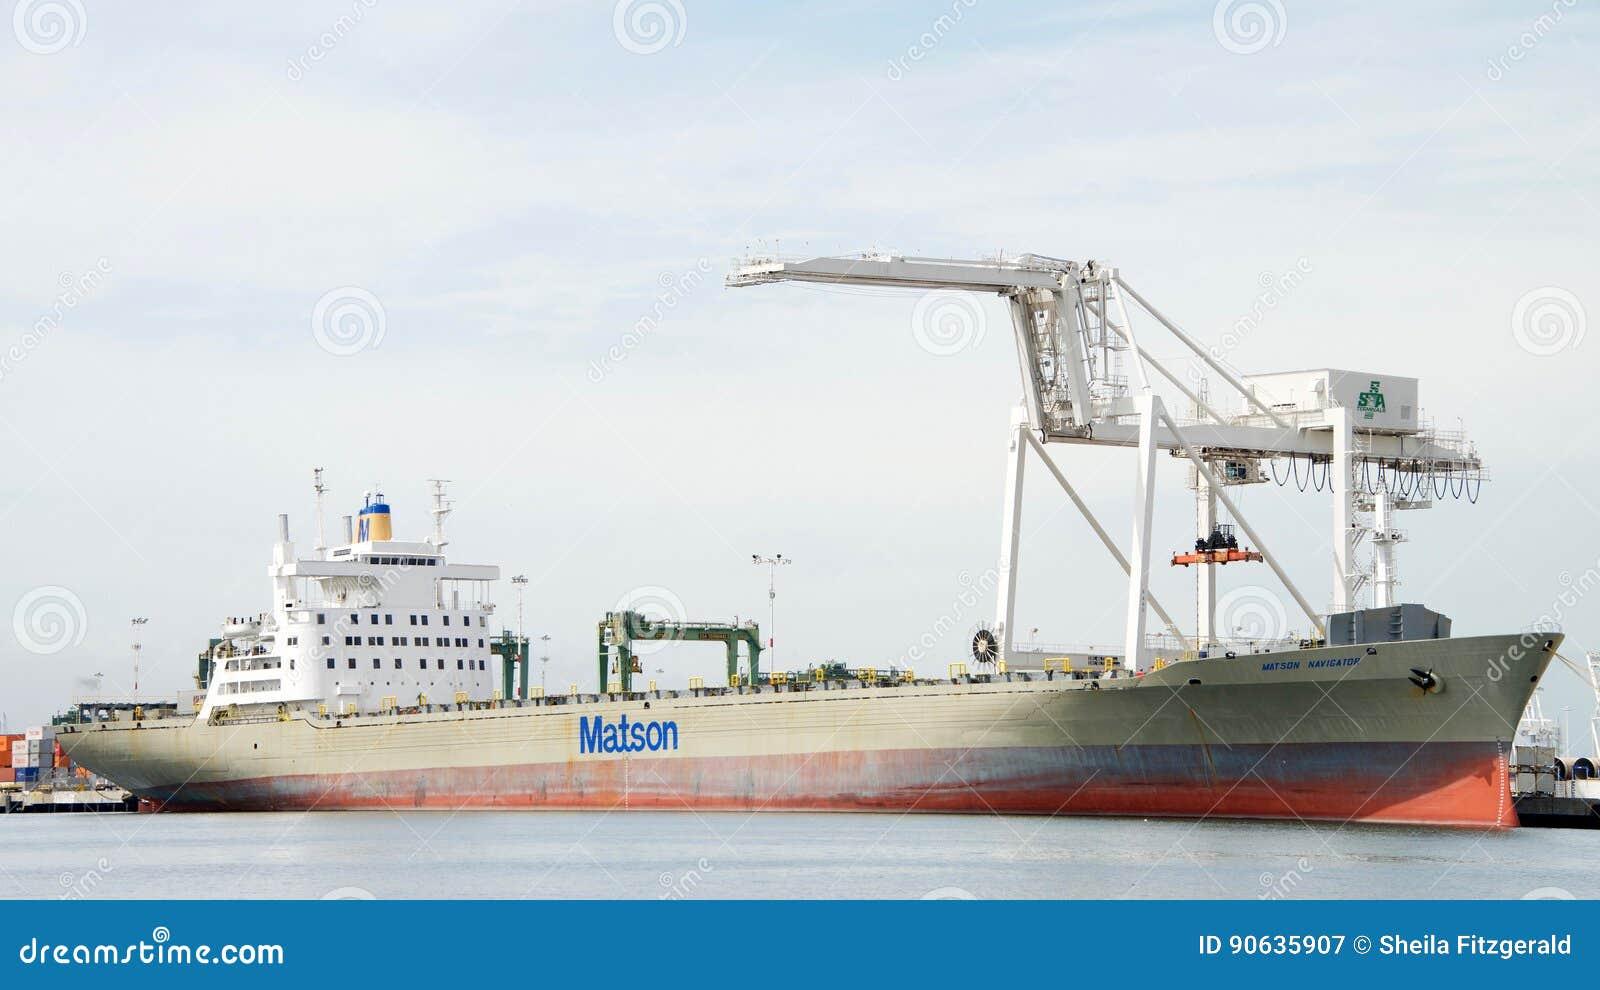 Matson Cargo Ship NAVIGATOR Docked At The Port Of Oakland